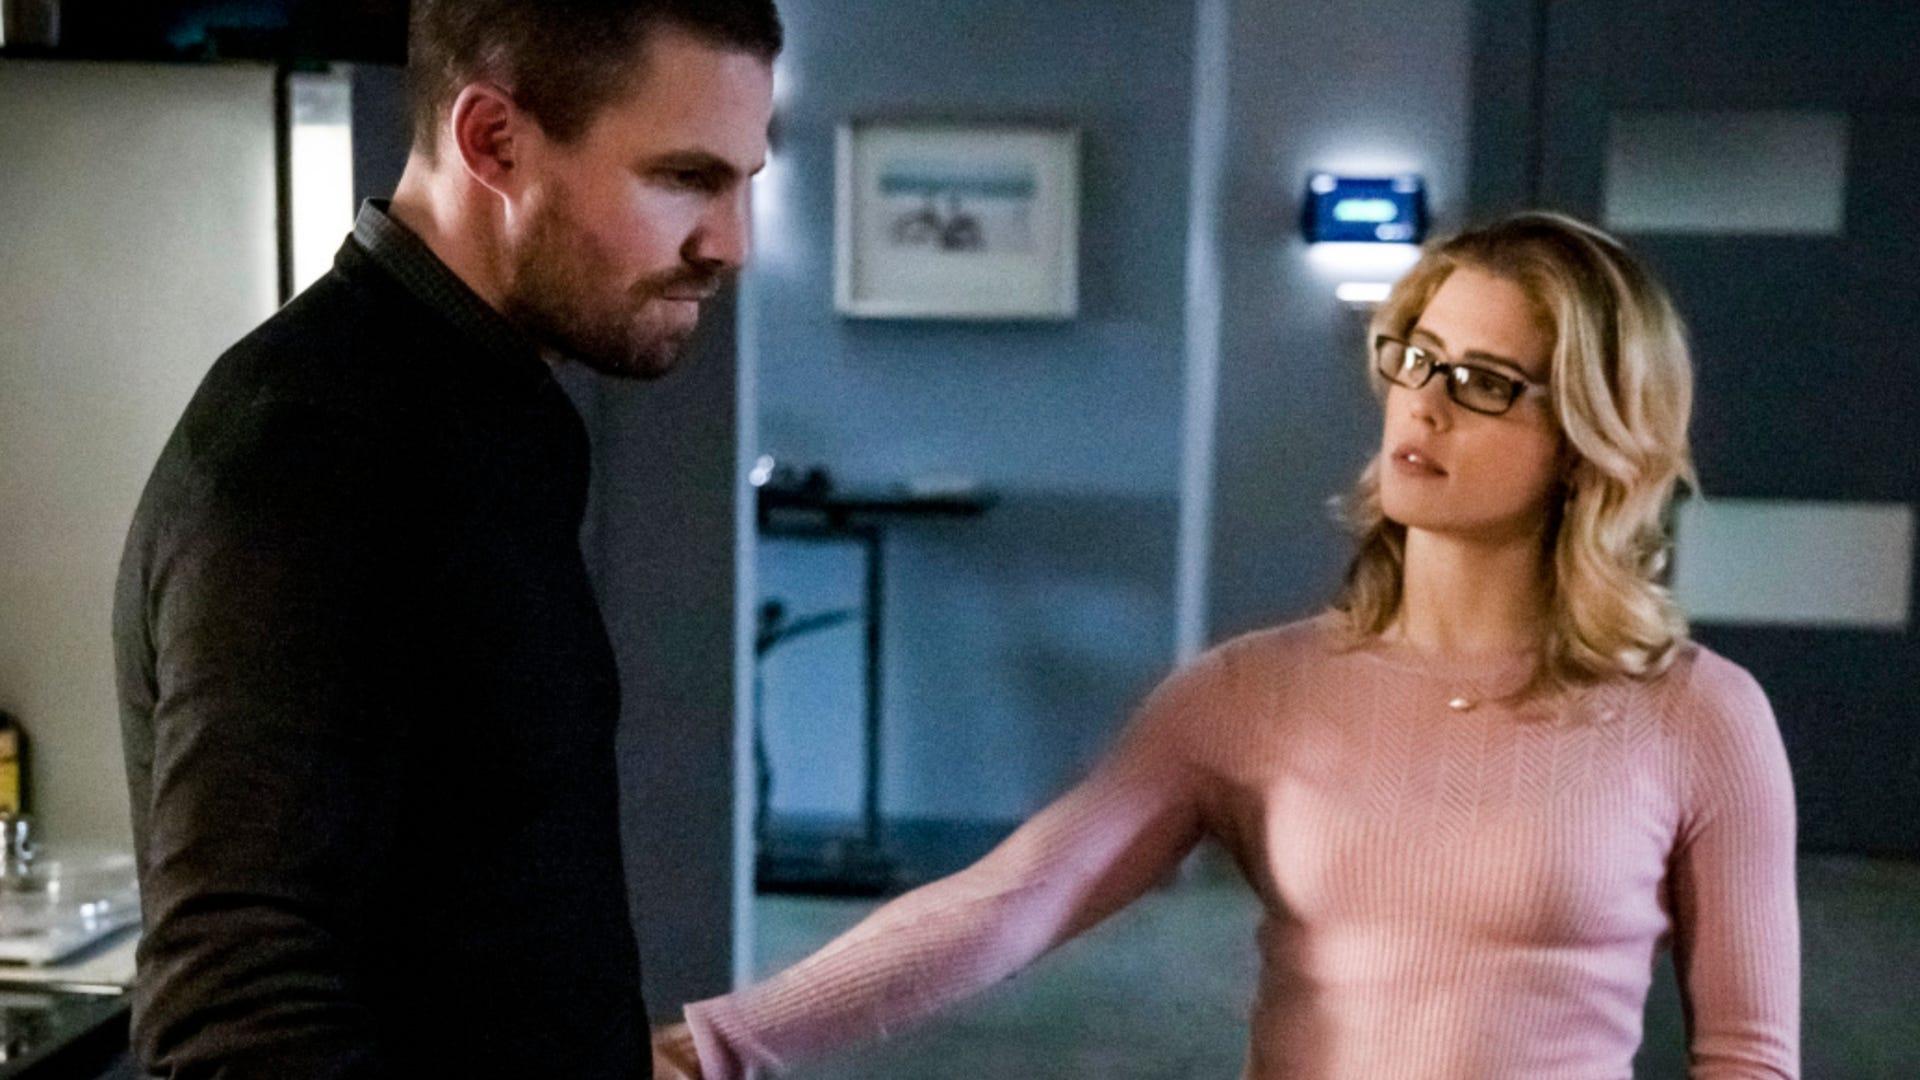 Stephen Amell and Emily Bett Rickards on Arrow